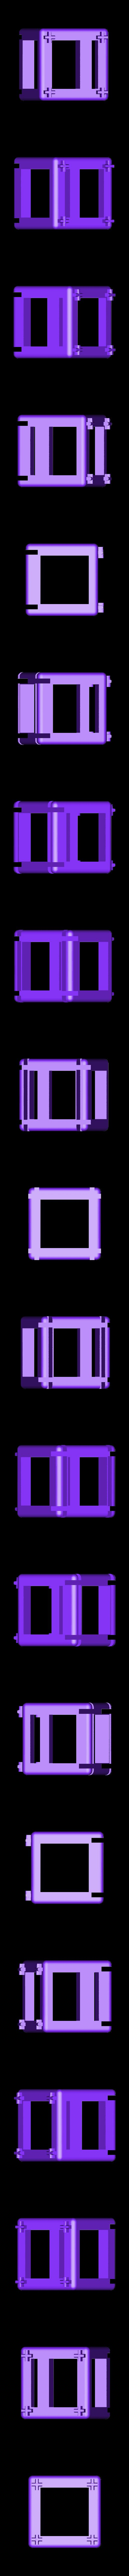 QM_Marble_Run_Support.stl Download free STL file QM Marble Run • 3D printer design, quirkymojo